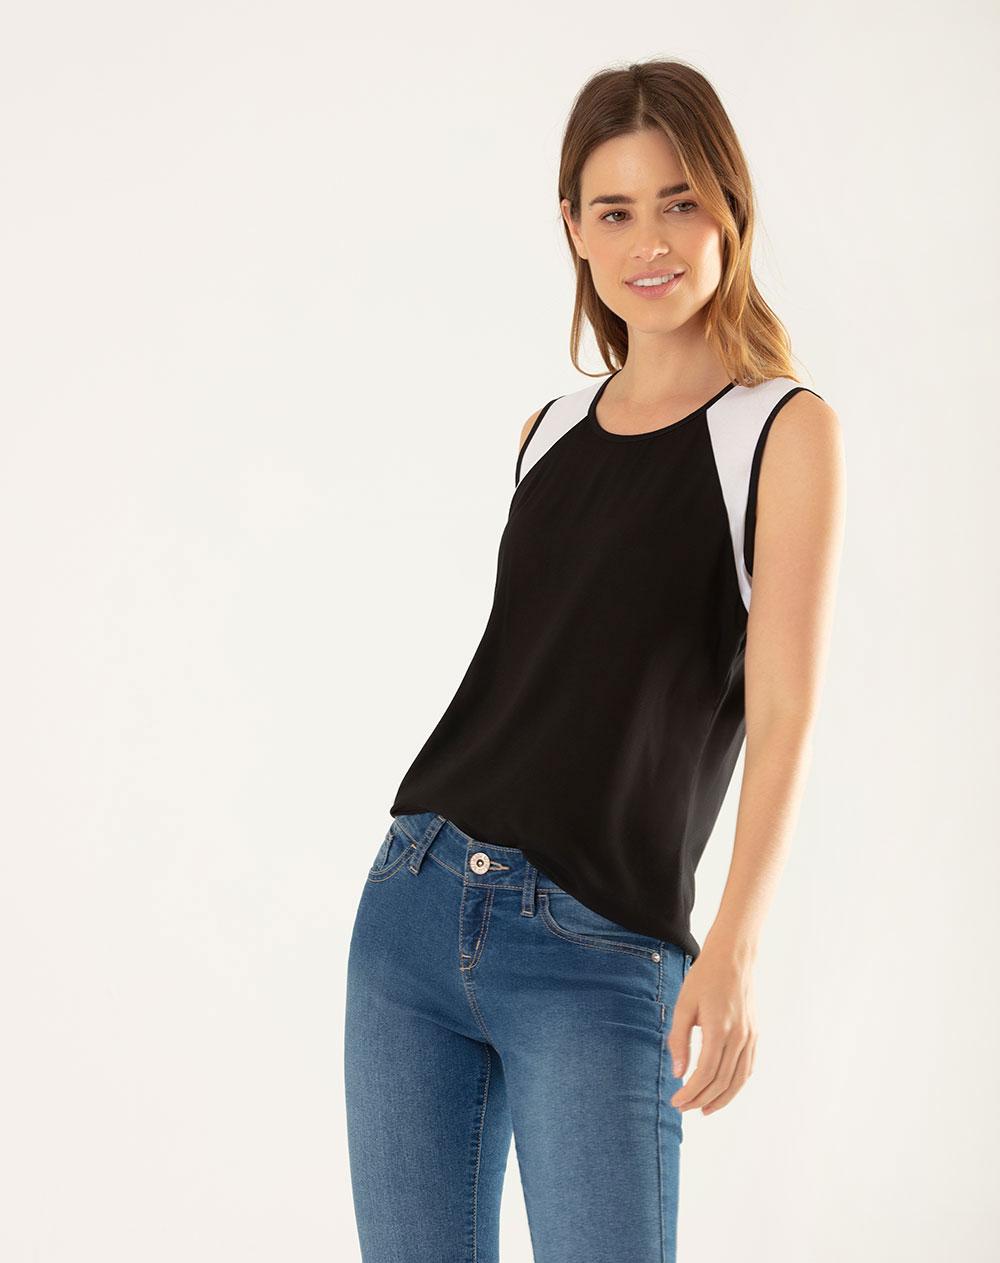 f193eec52b4e Camisas para Mujer Gef